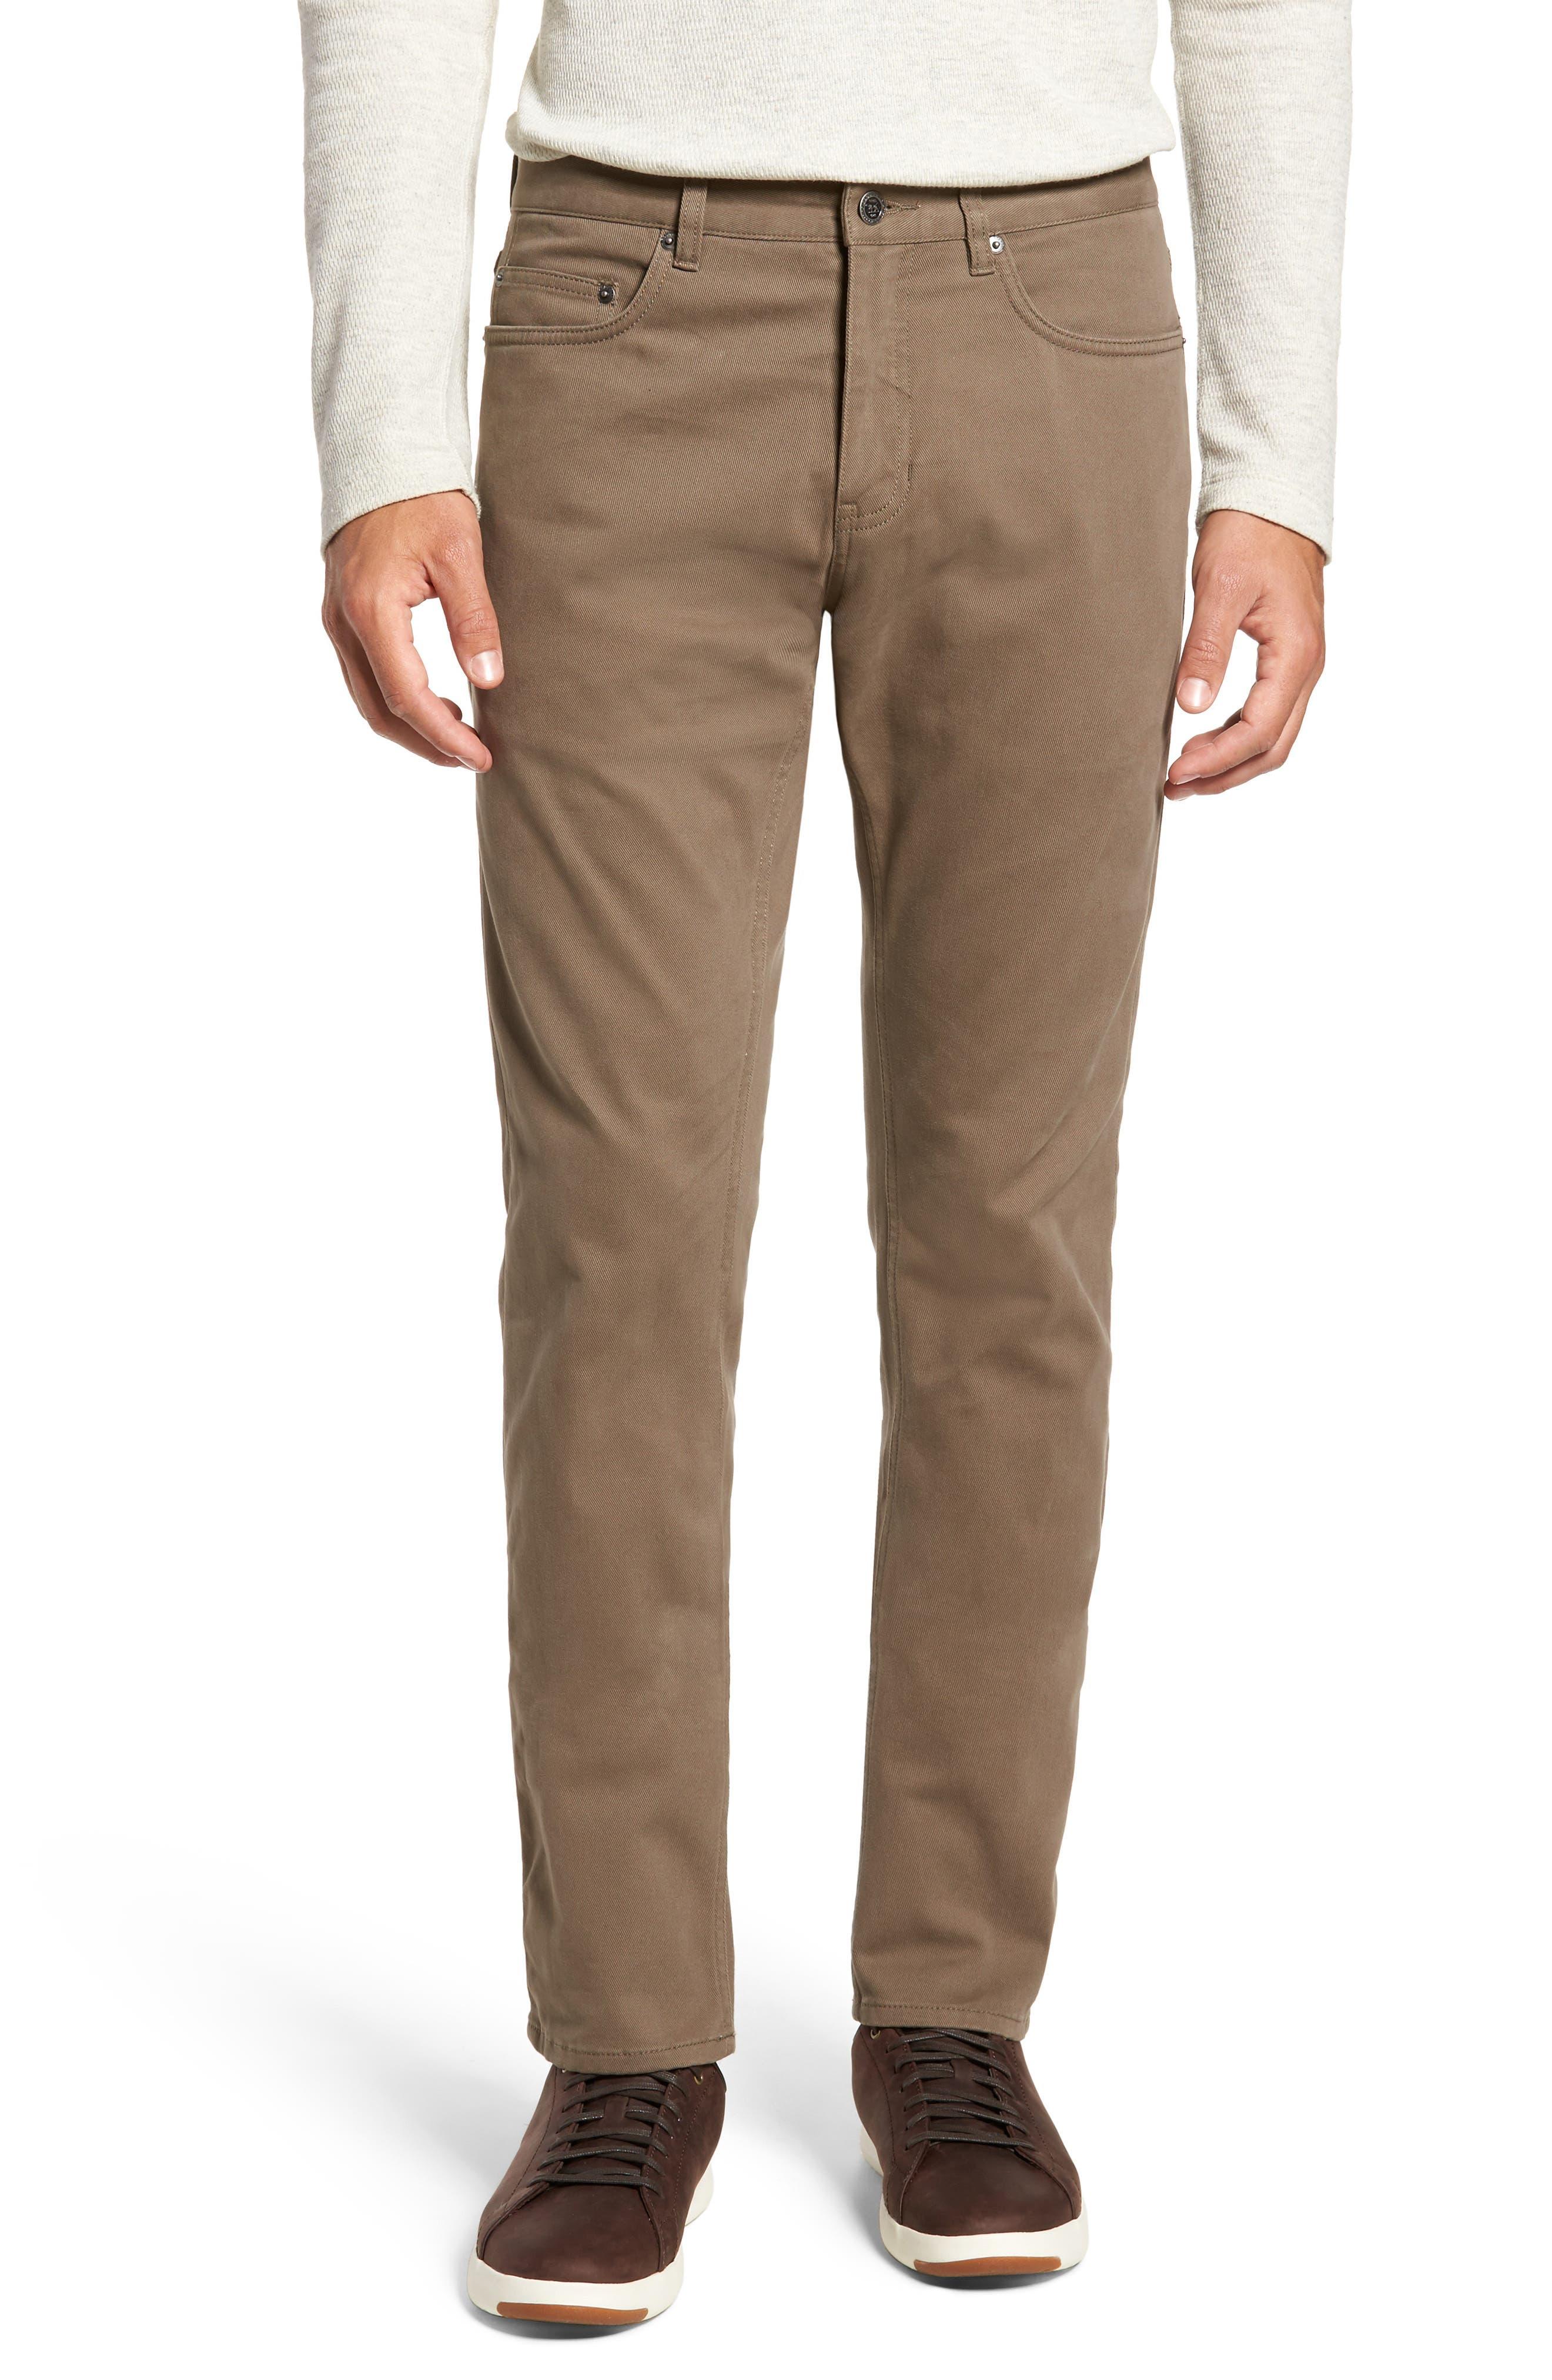 Clearance Rodd & Gunn Hawdon Straight Leg Jeans Cheap Sale Store Sale Geniue Stockist Outlet Pre Order Outlet Amazon nDAiziQYx